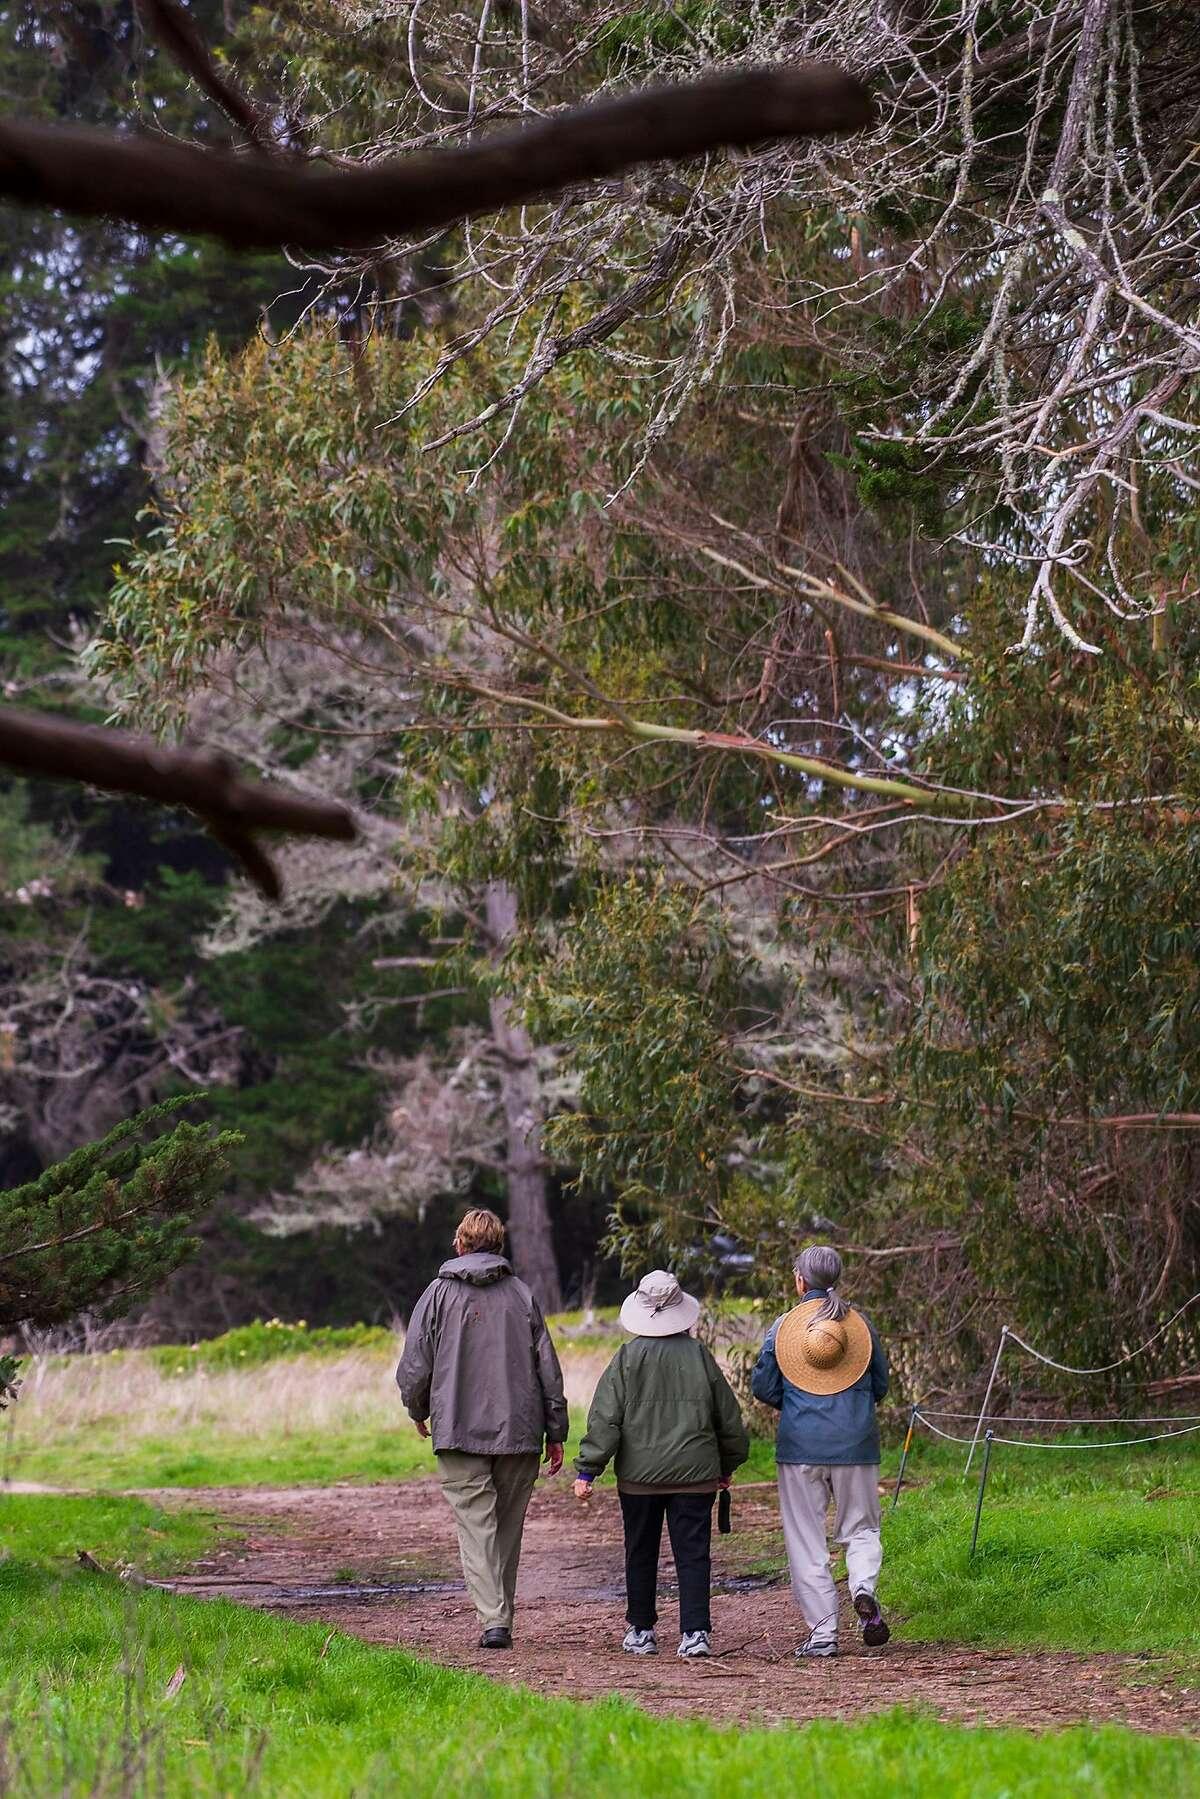 Judy Ward, right, walks with friends through Lighthouse Field State Park in Santa Cruz, Calif. on Jan. 11, 2019.